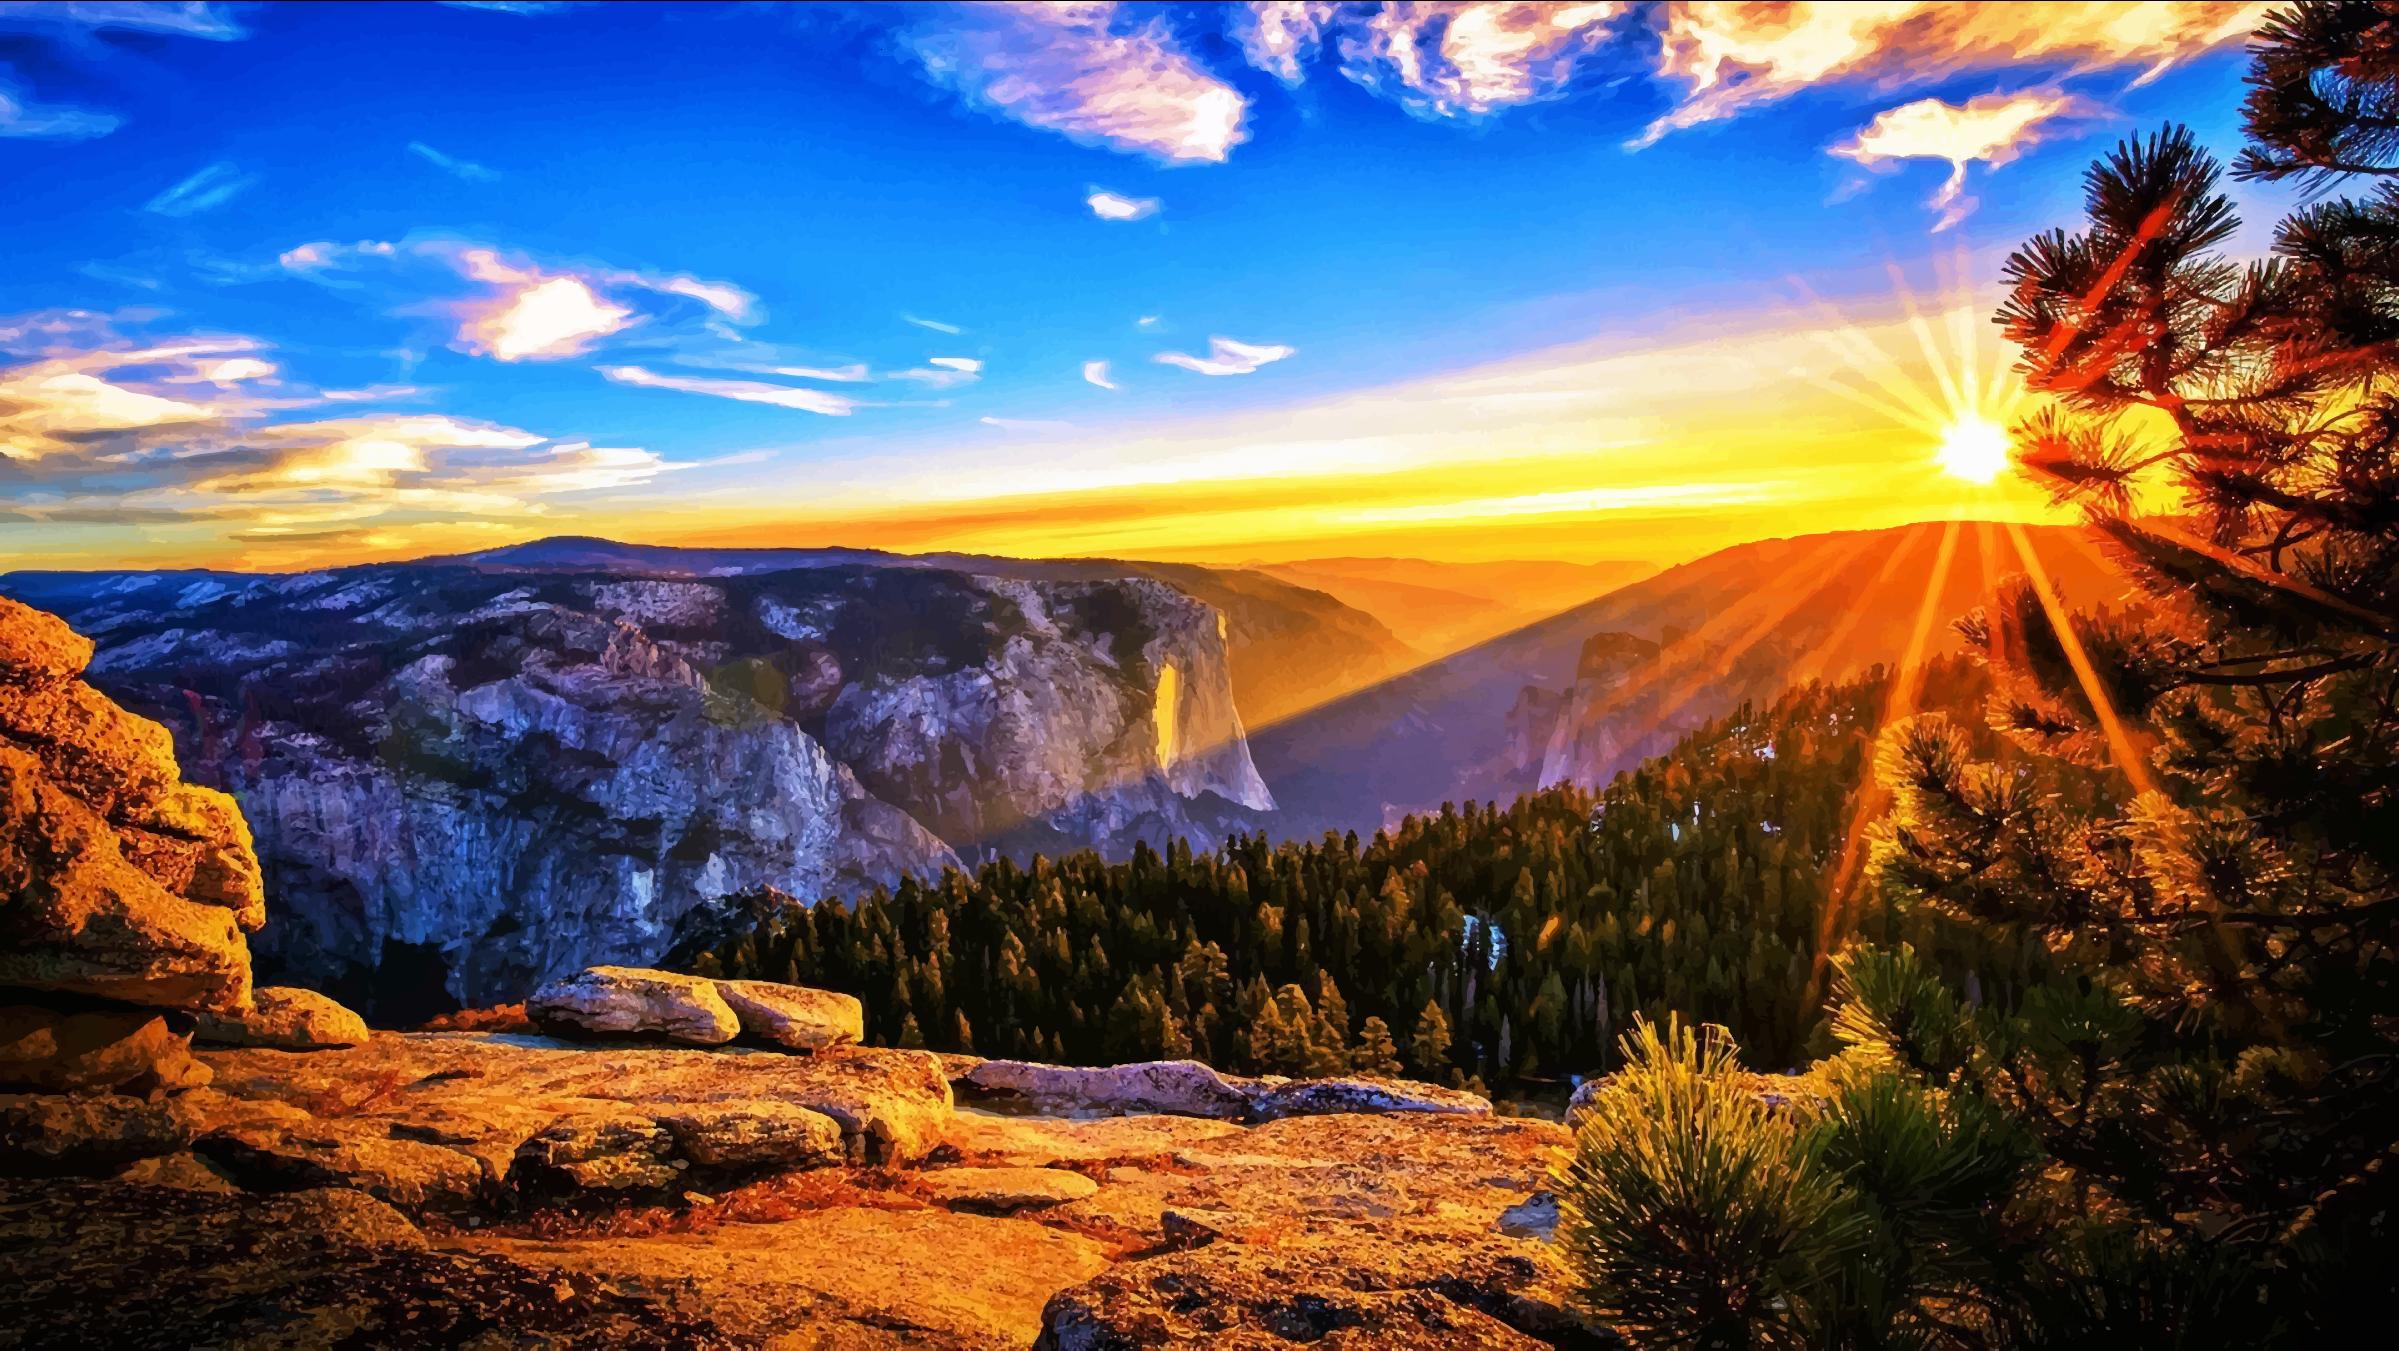 Alabama Hills at Sunrise, California скачать